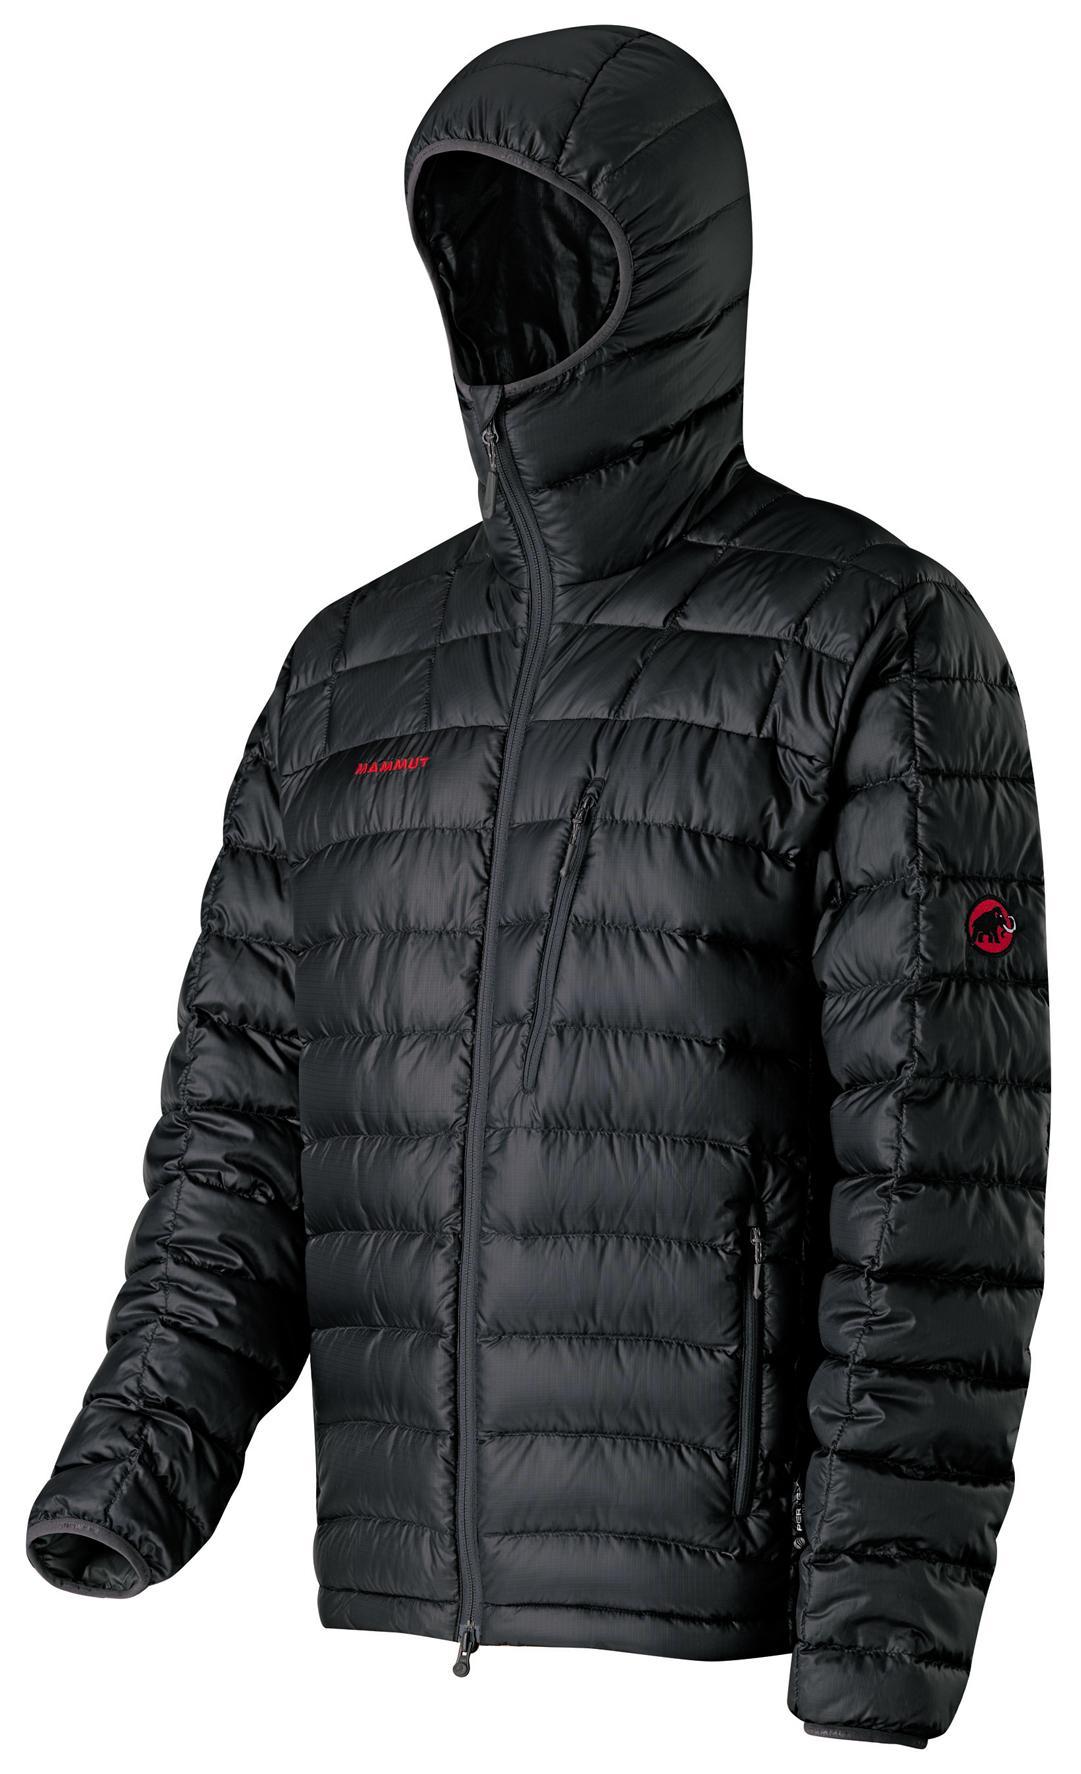 Mammut Masao Jacket - Hardshelljacke Herren online kaufen